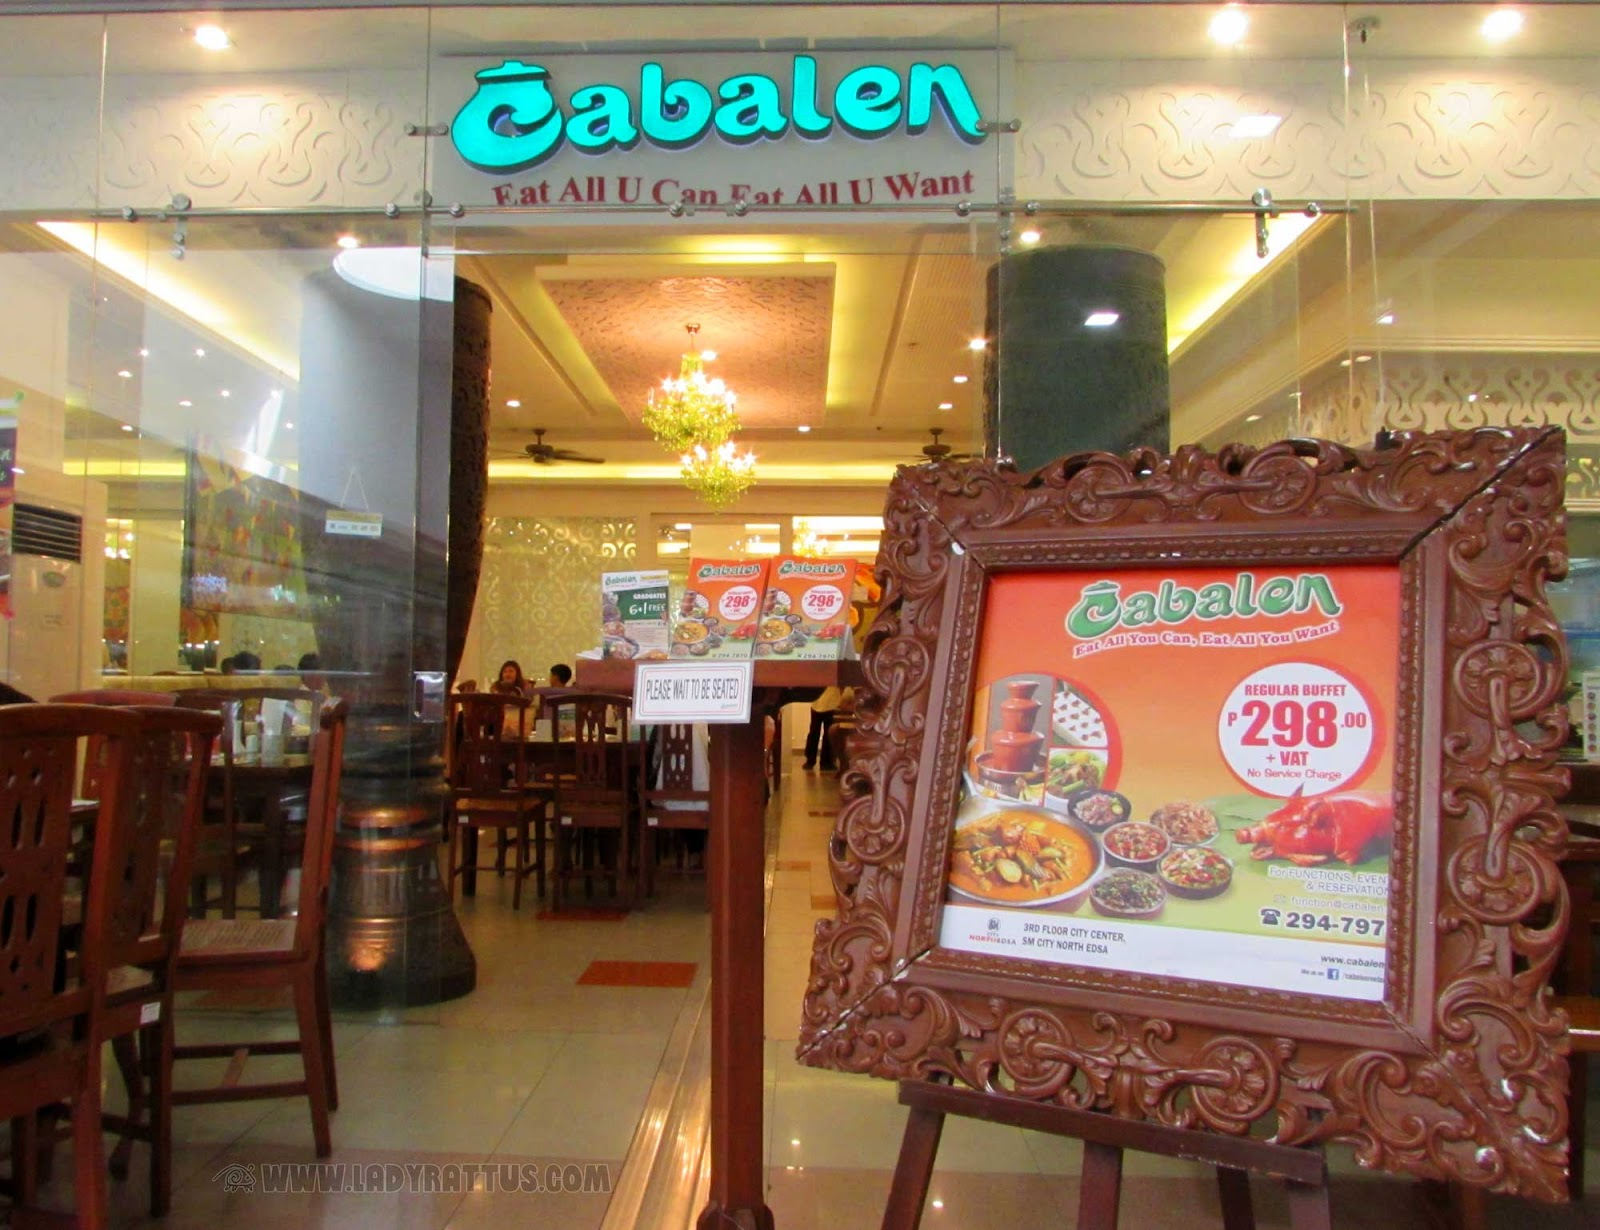 Buffet Meal at Cabalen's Restaurant, SM North